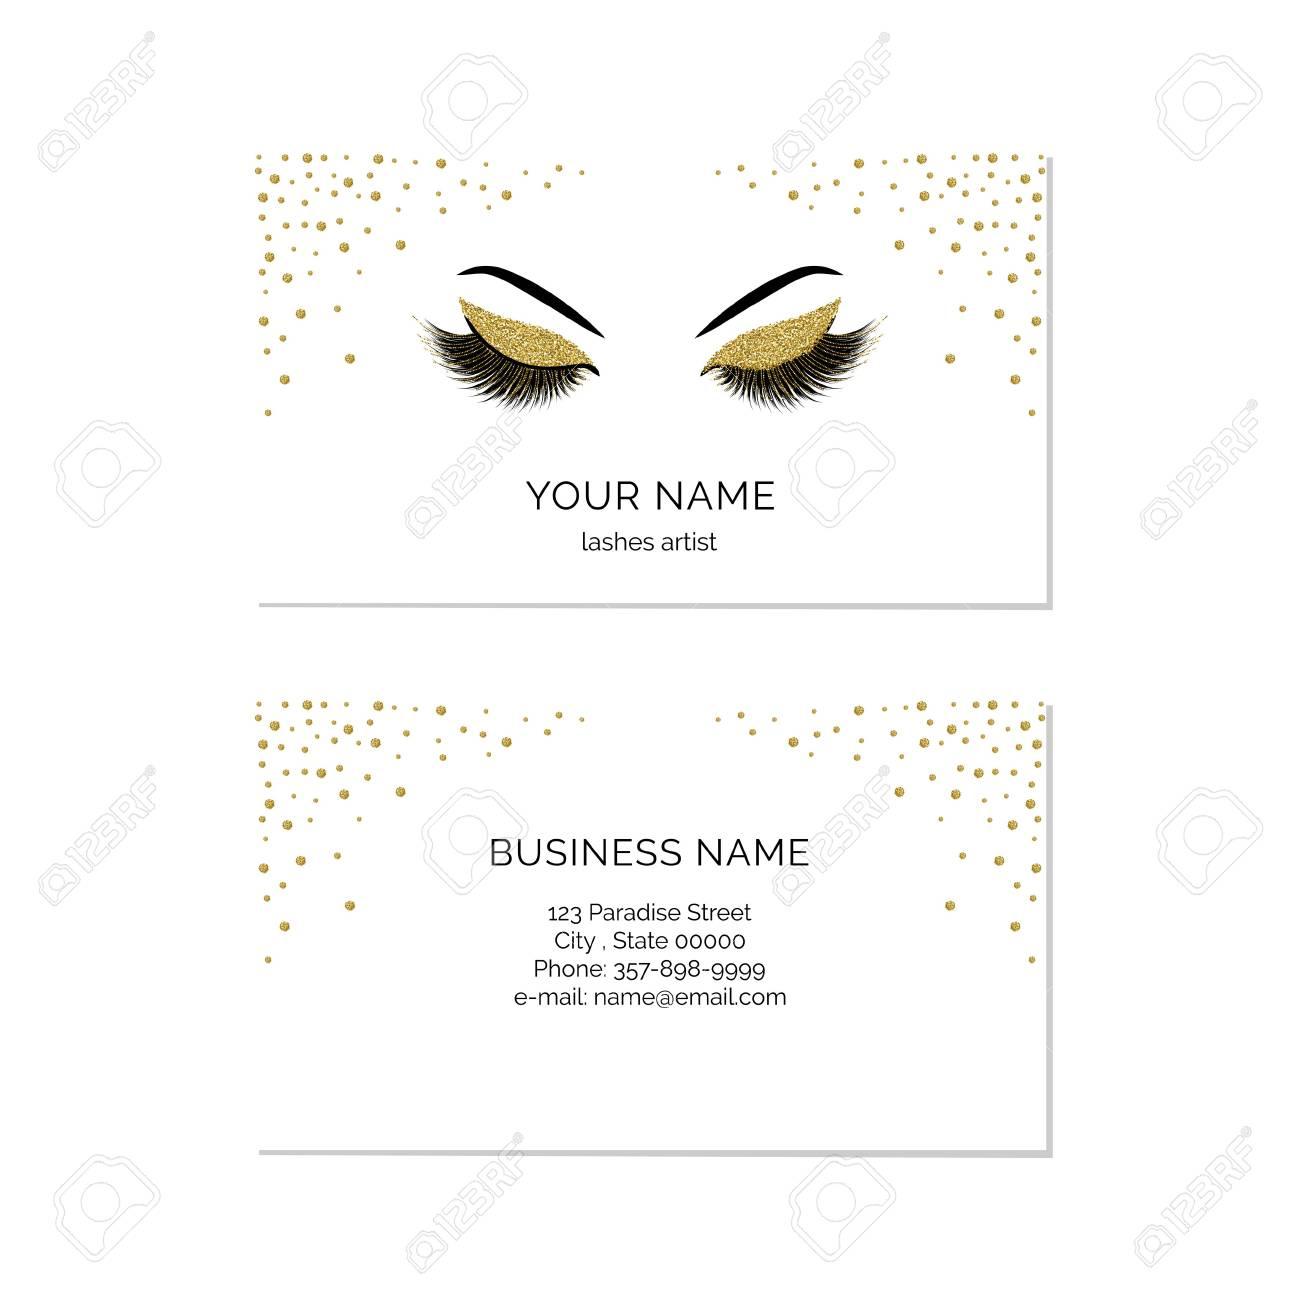 Makeup artist business card vector template royalty free cliparts makeup artist business card vector template stock vector 92543589 cheaphphosting Choice Image